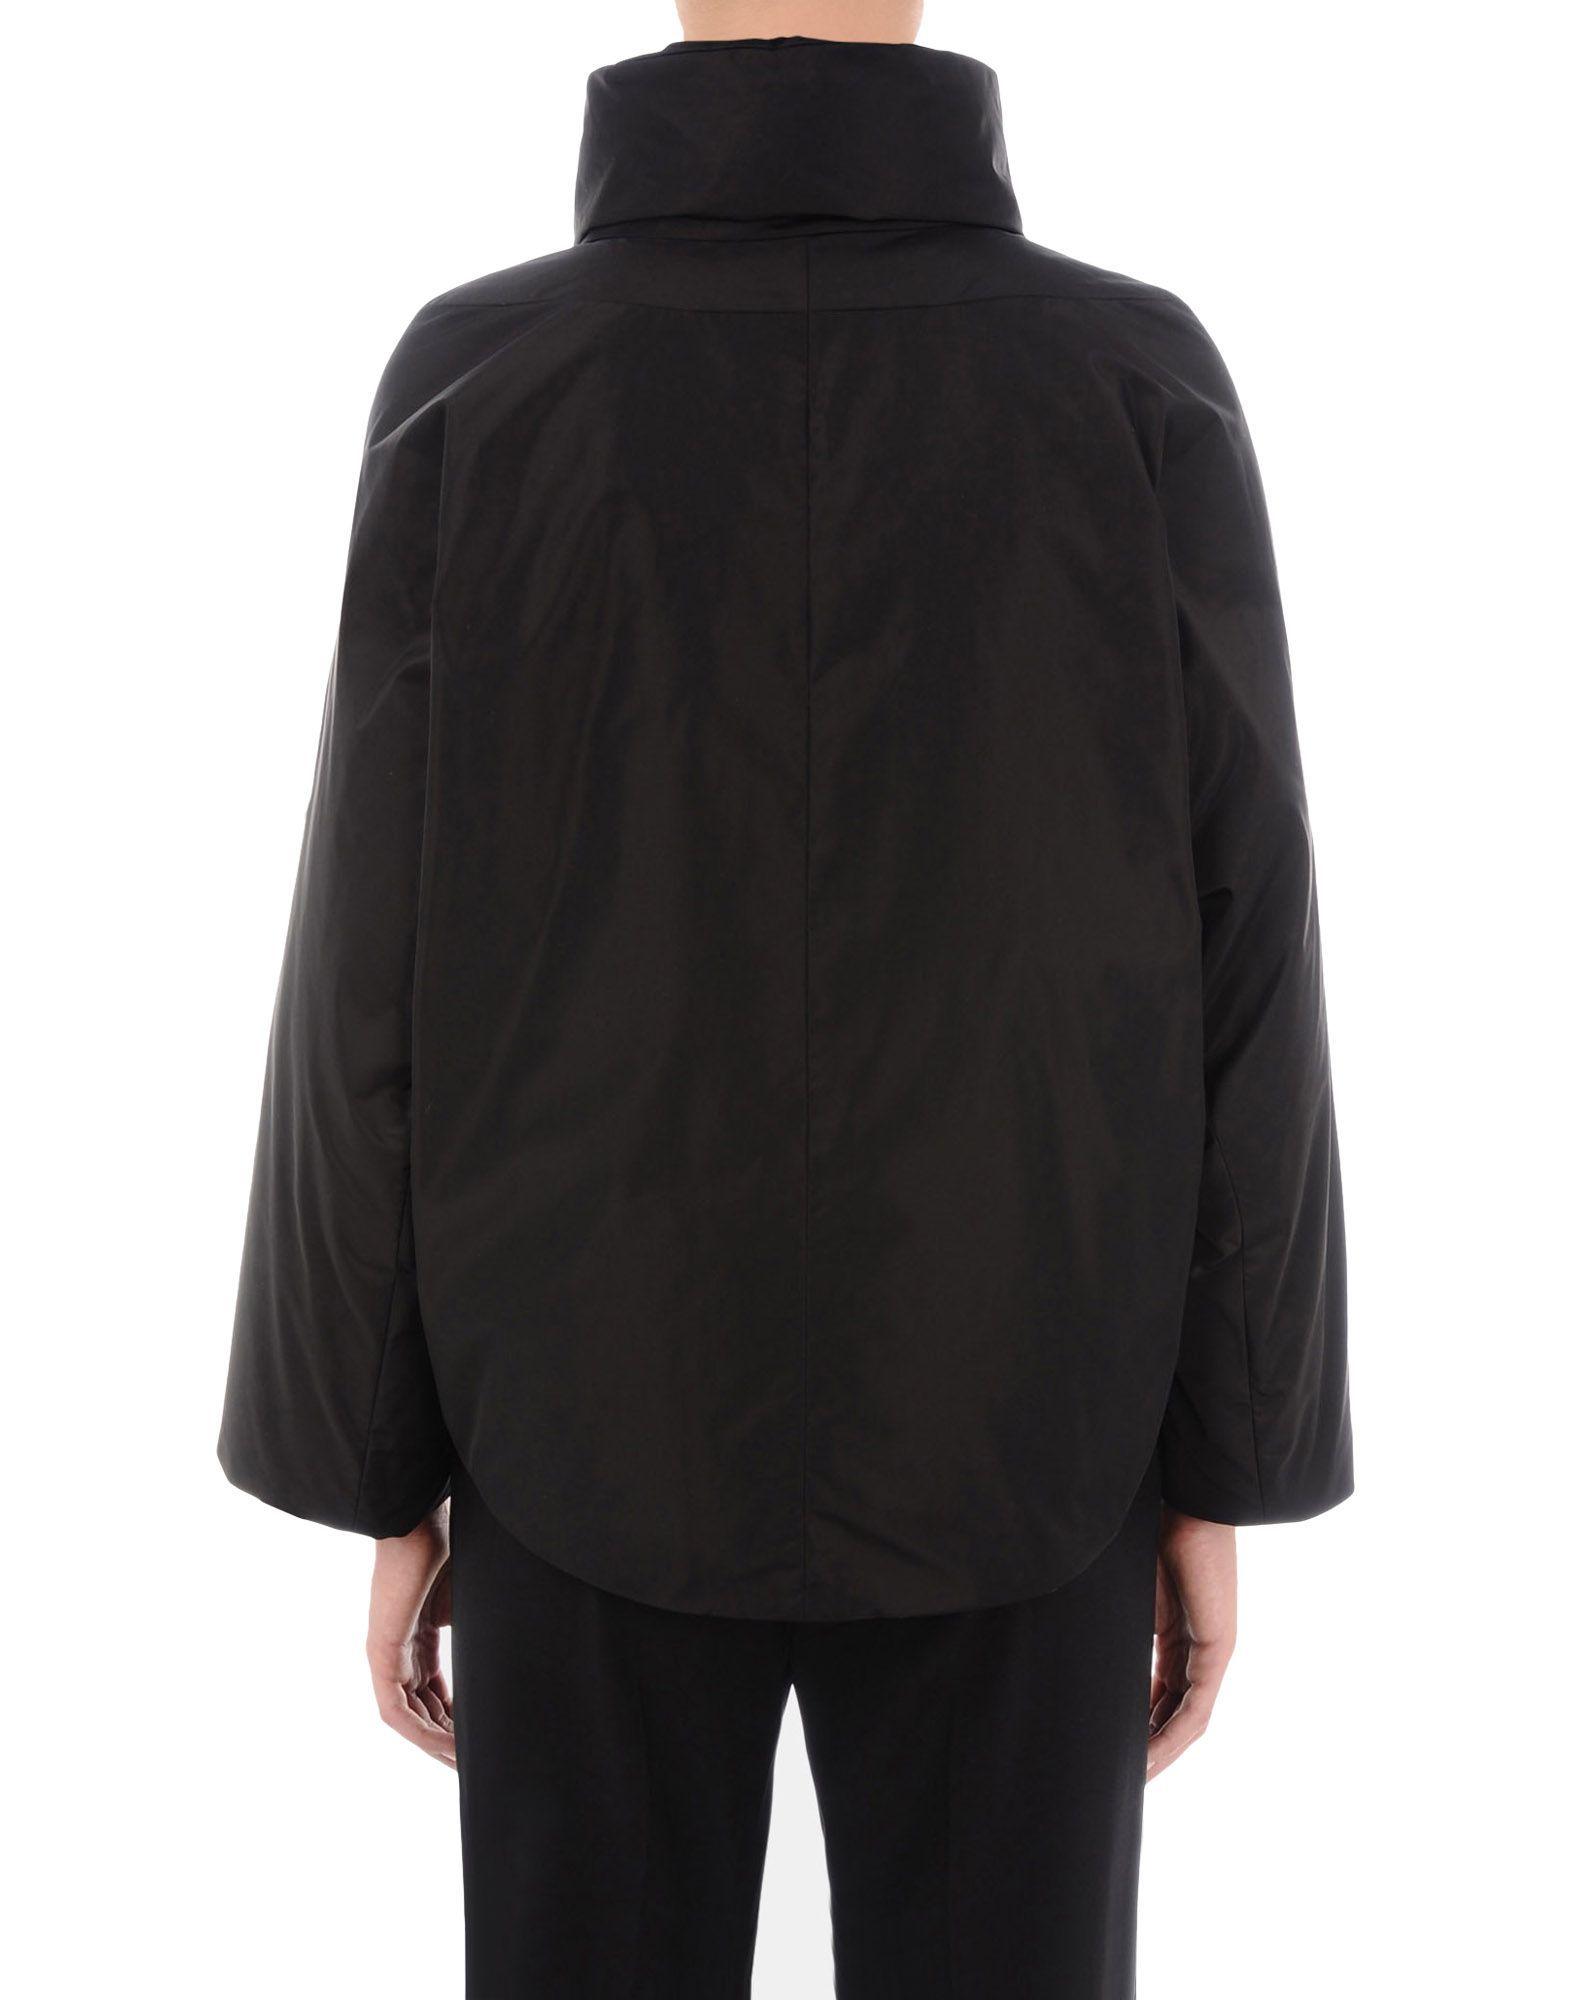 Jil Sander Black Techno Fabric Padded Jacket